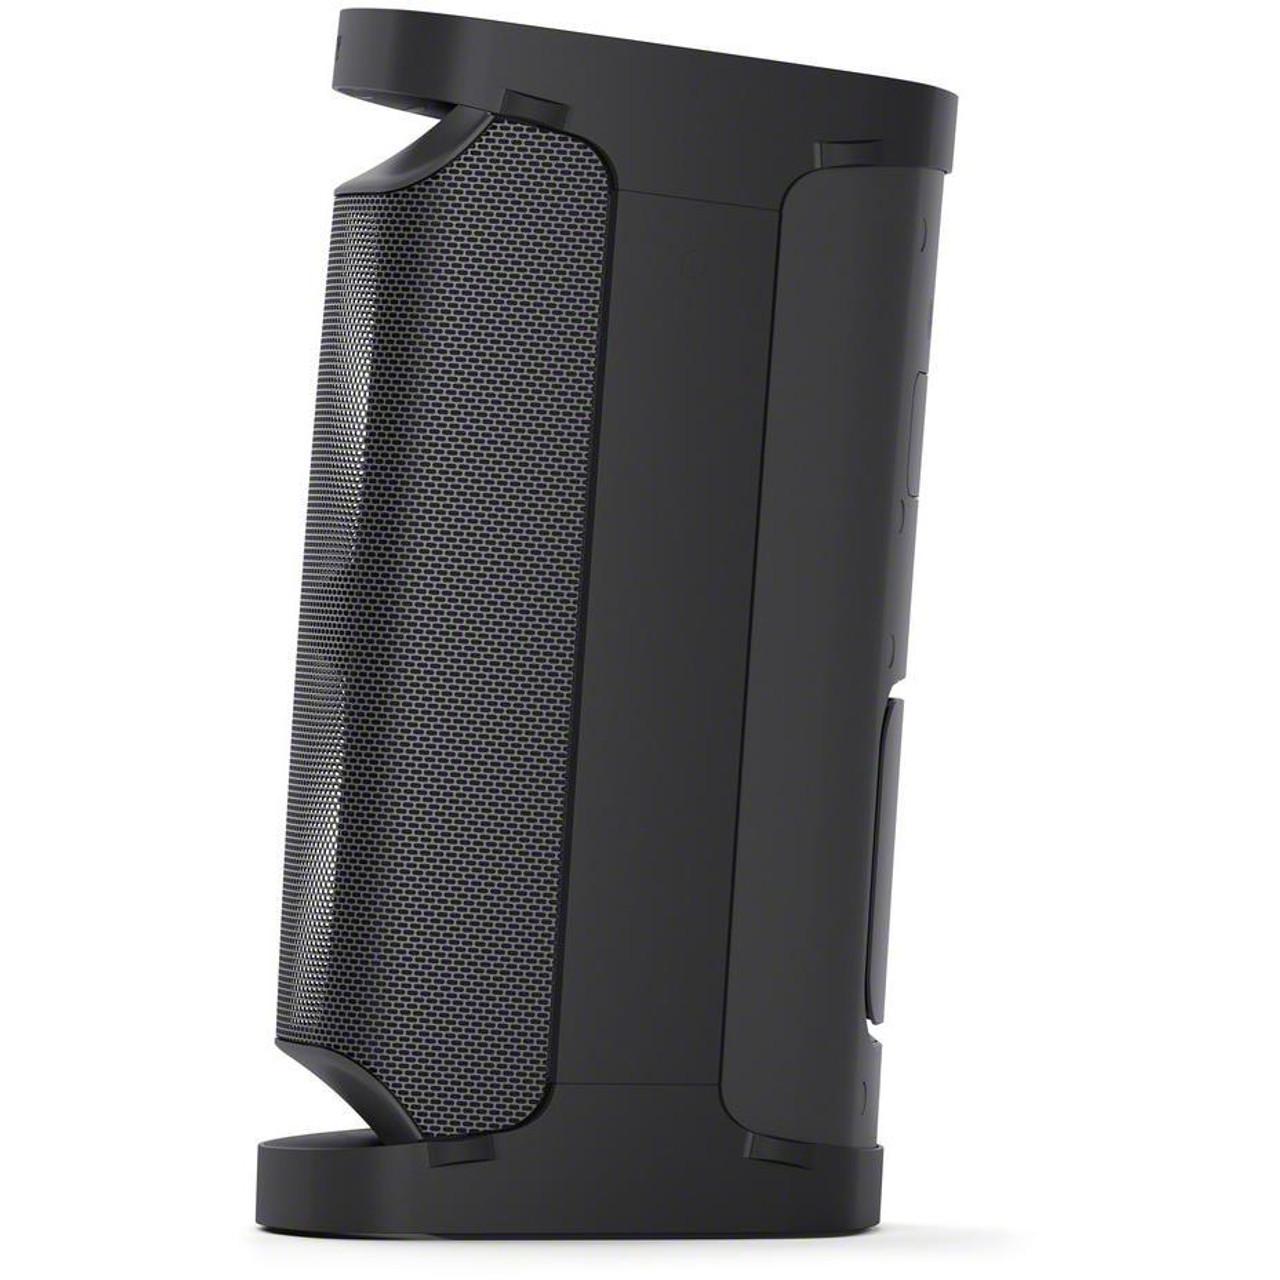 Sony SRS-XP500 X Series Bluetooth Portable Wireless Party Speaker - Black